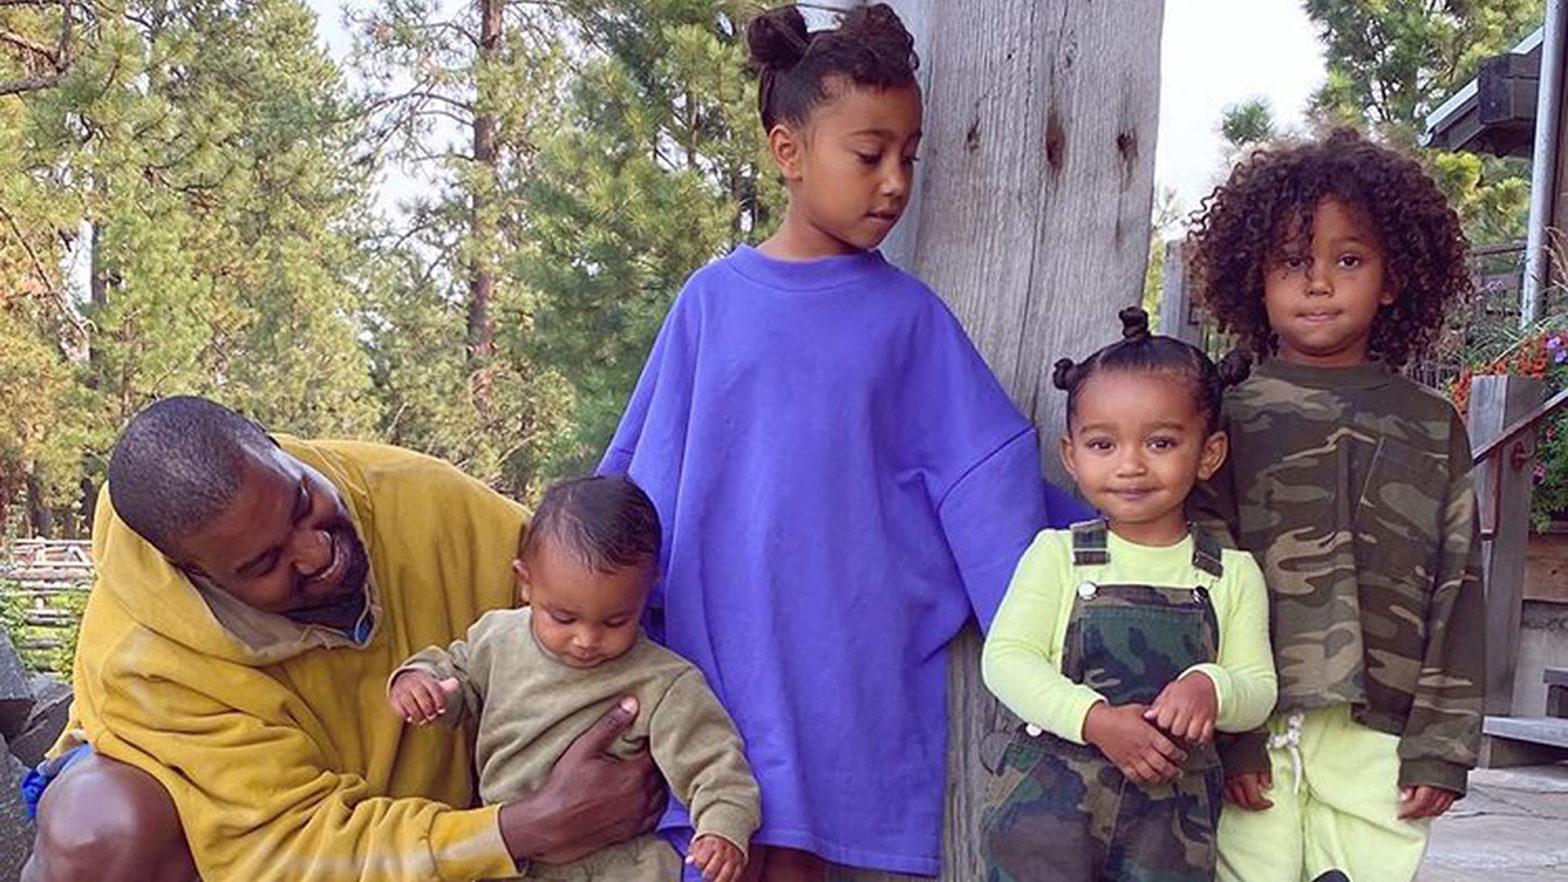 Billionaire Babies Club: Meet The Children Of The World's Black Billionaires